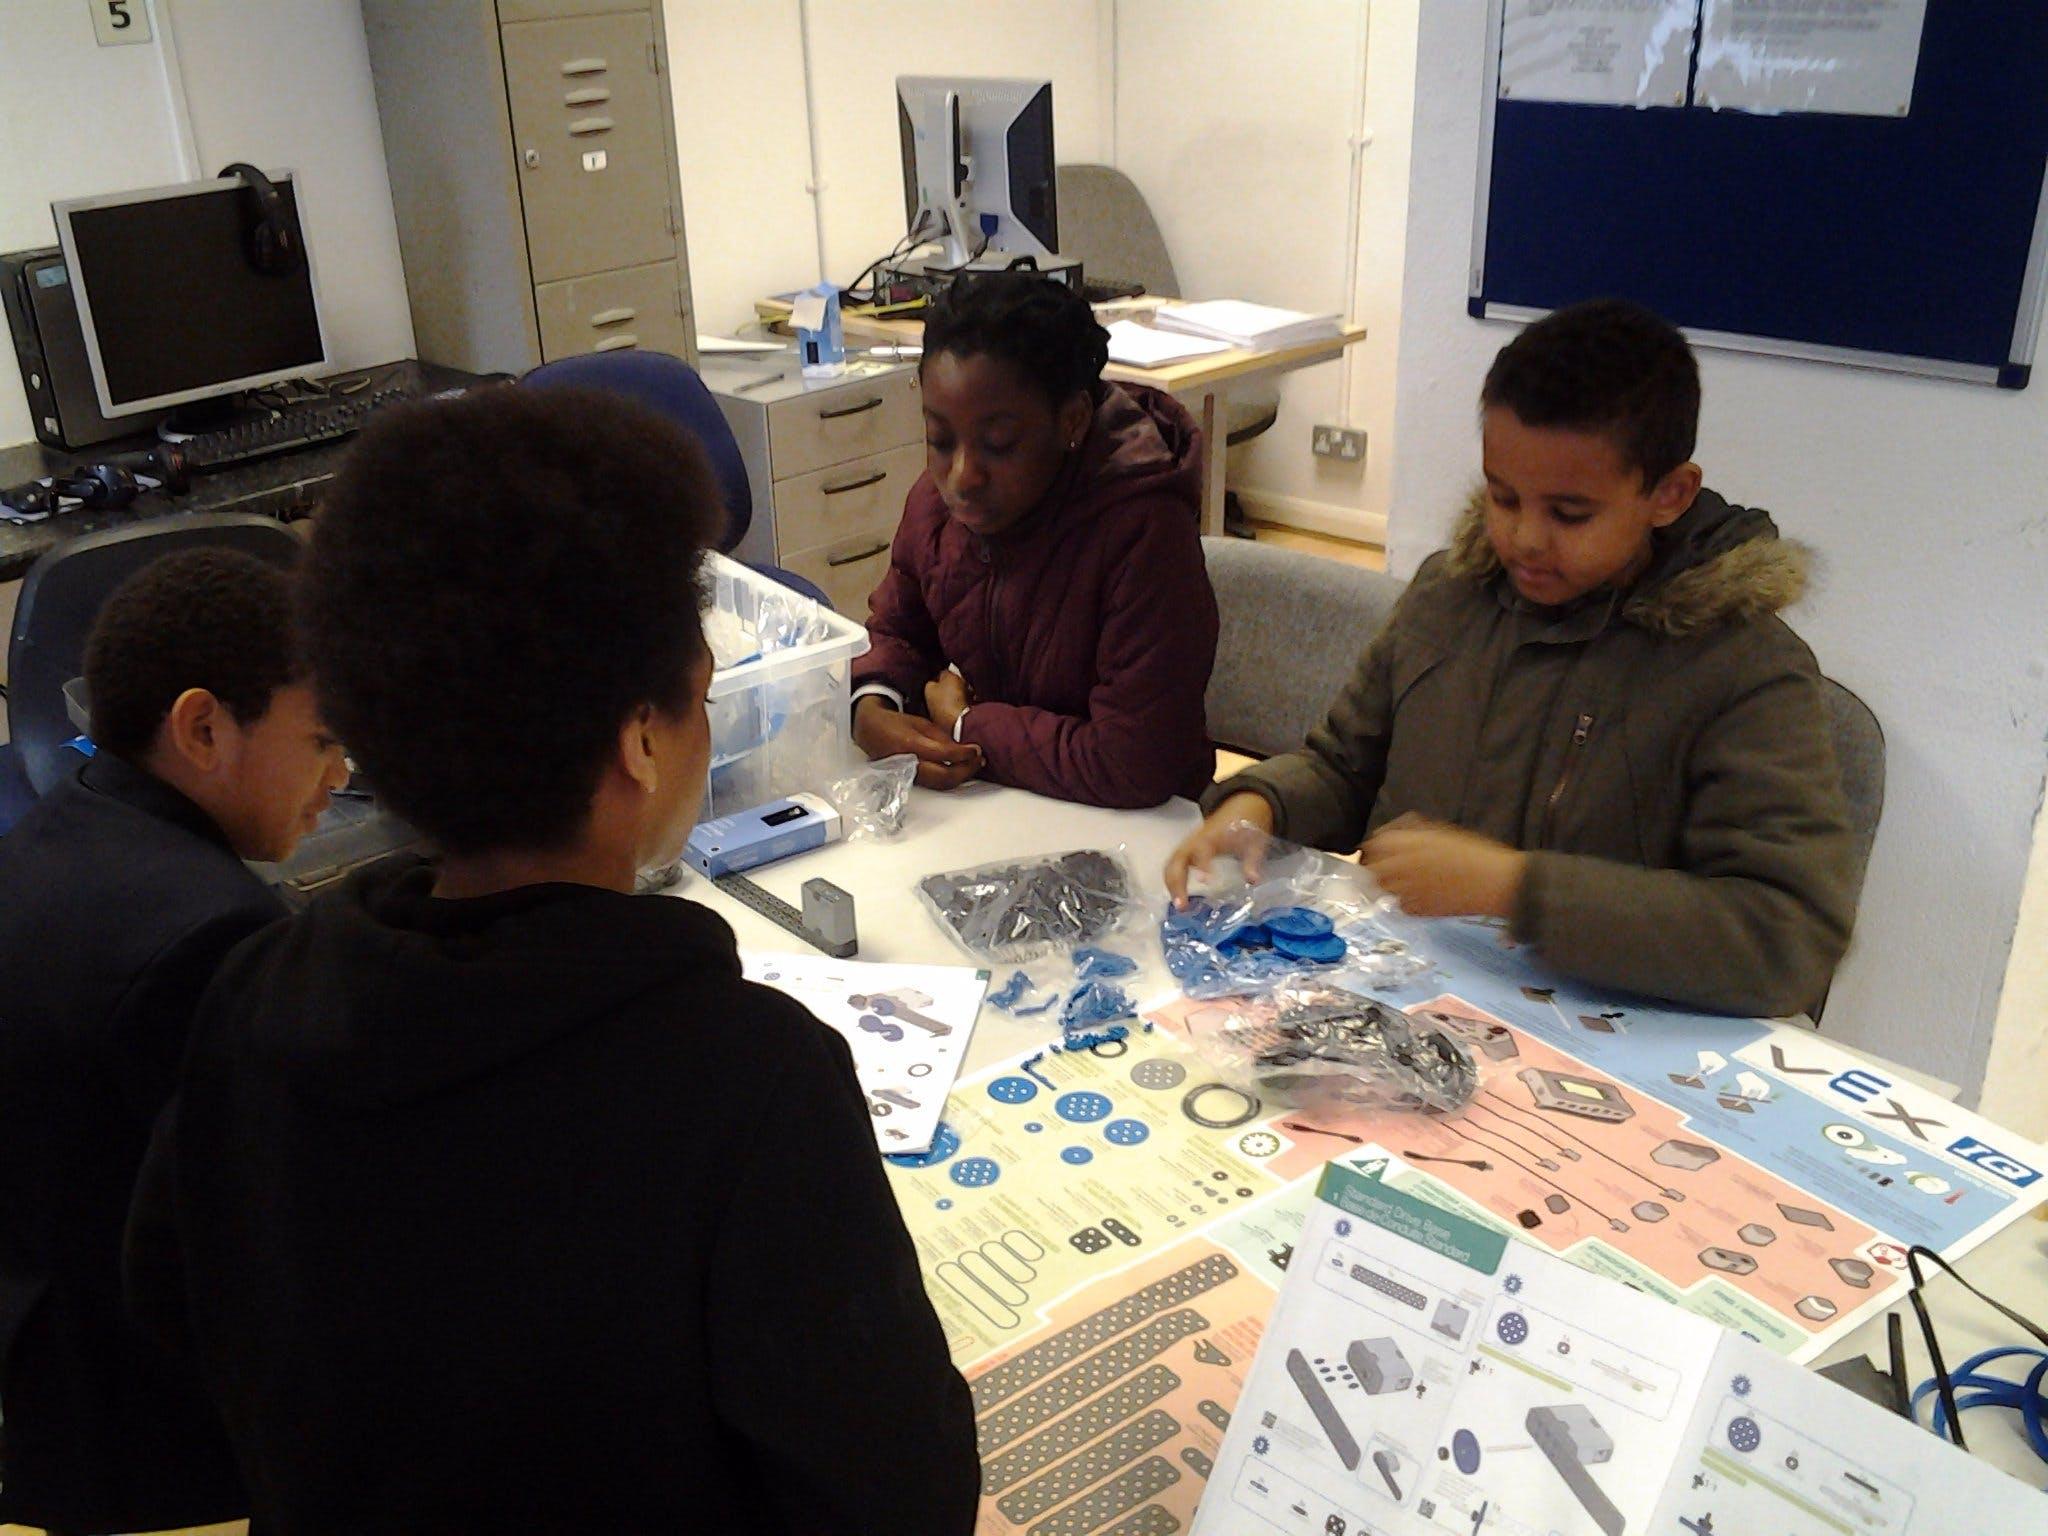 Teaching Kids Robotics: Robot Building Engineering Part-1